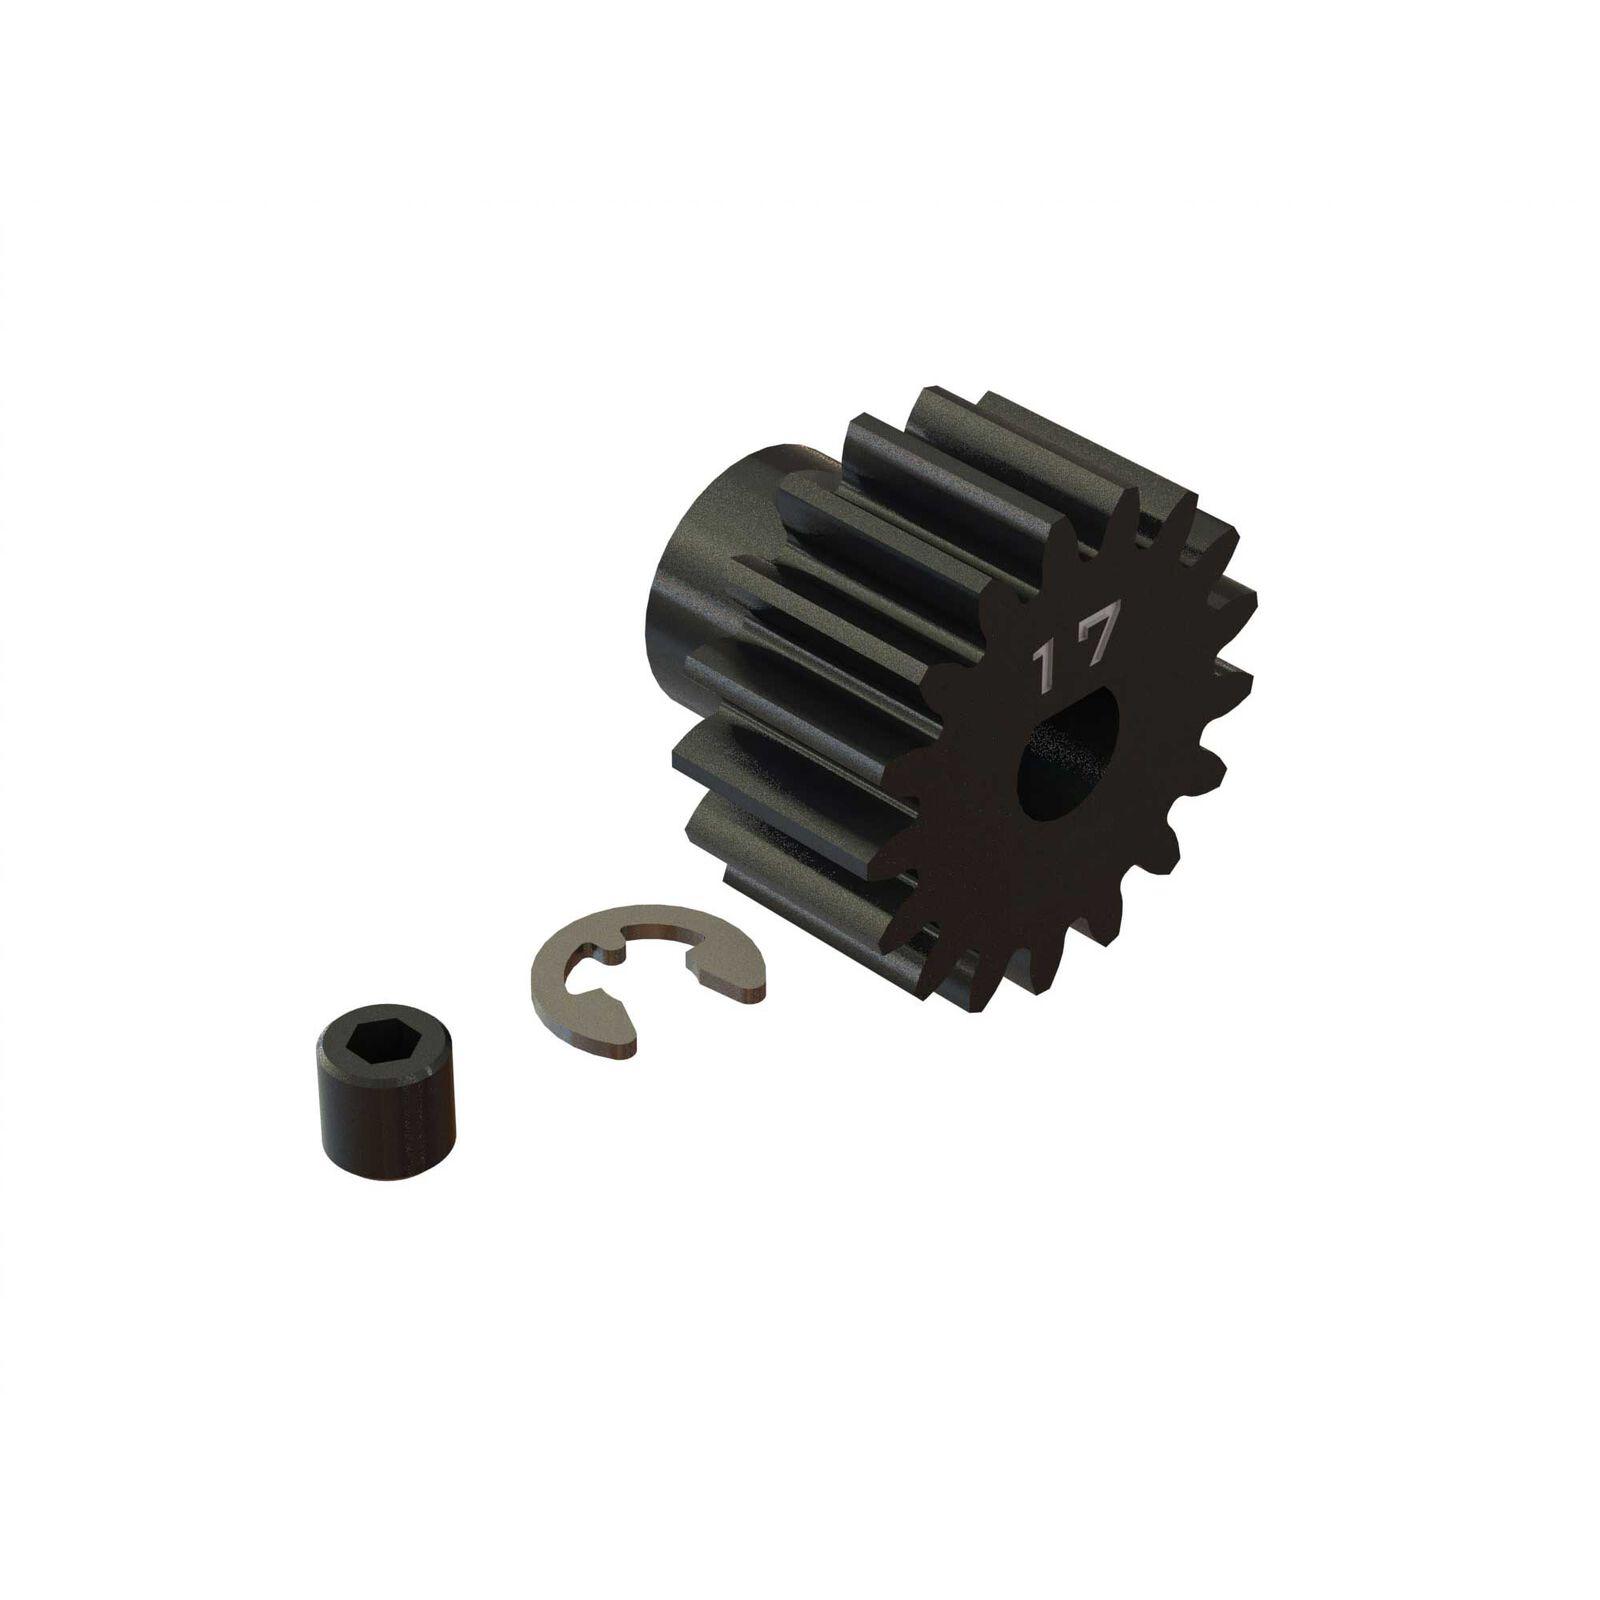 Pinion Gear, 17T HD Mod1 Safe-D5